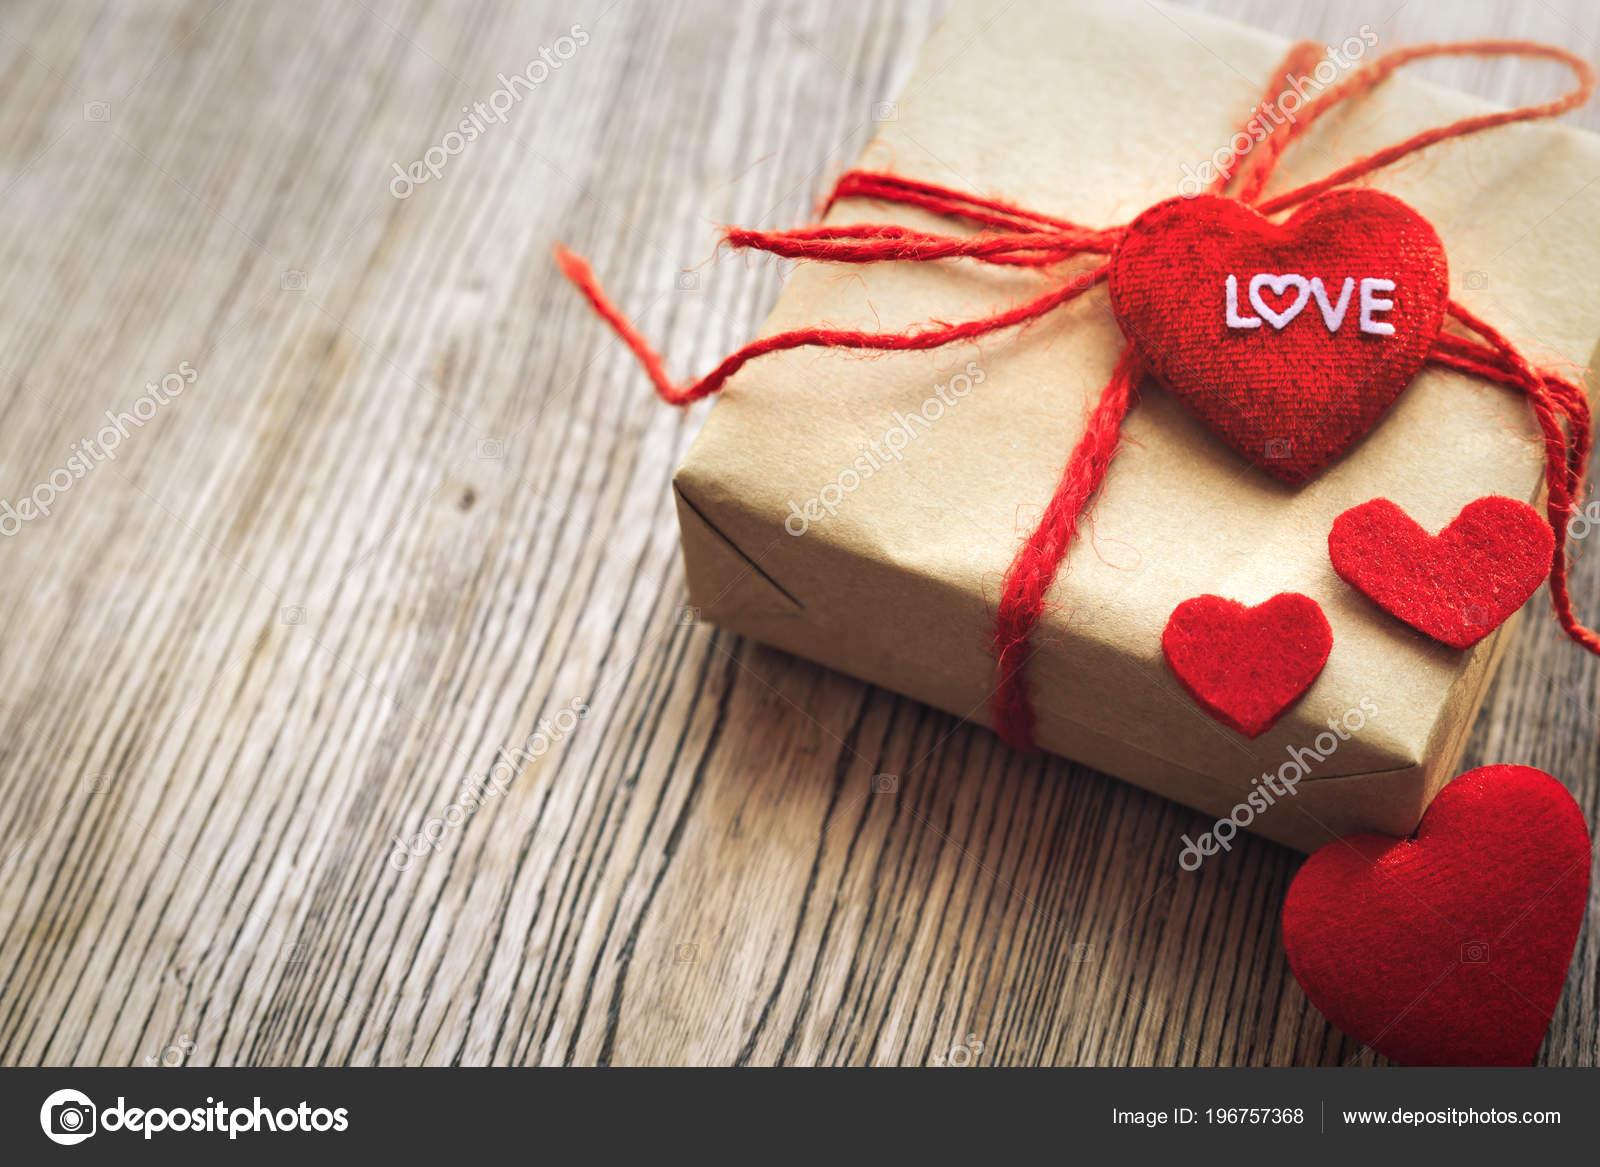 Heart Shape Love Word Gift Box Flower Copye Texting Stock Photo